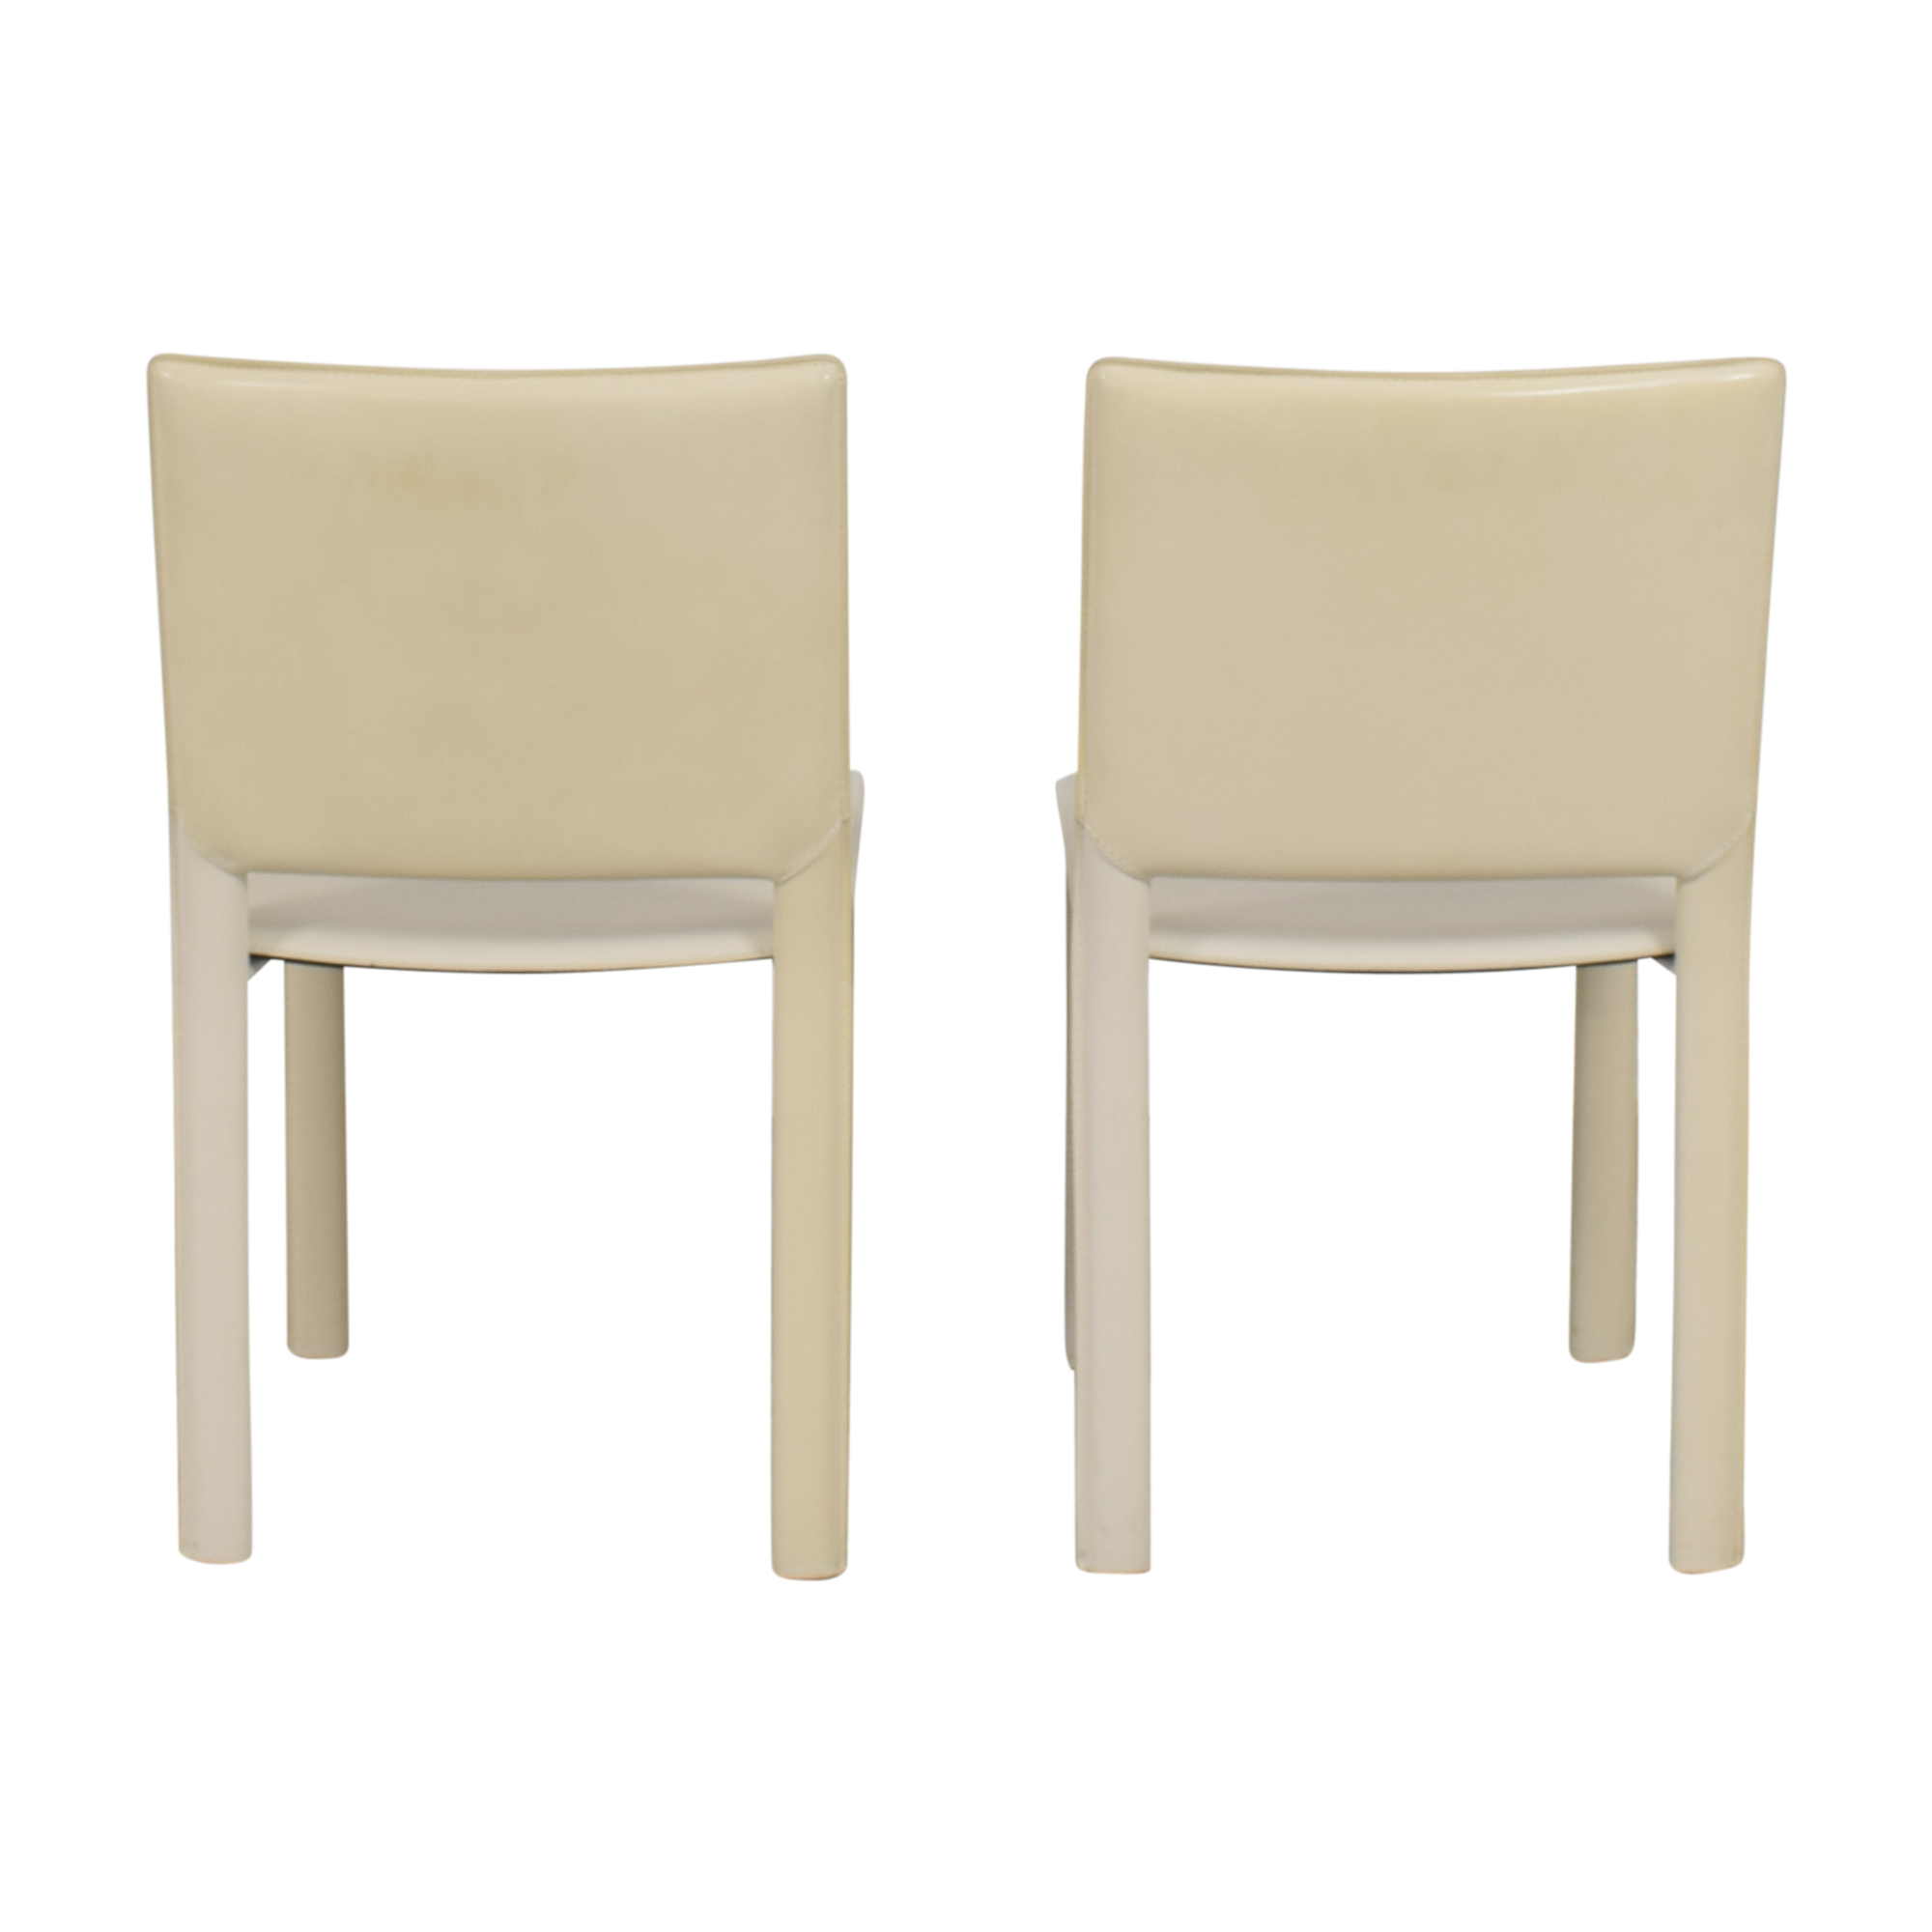 Room & Board Room & Board Madrid Dining Chairs ma